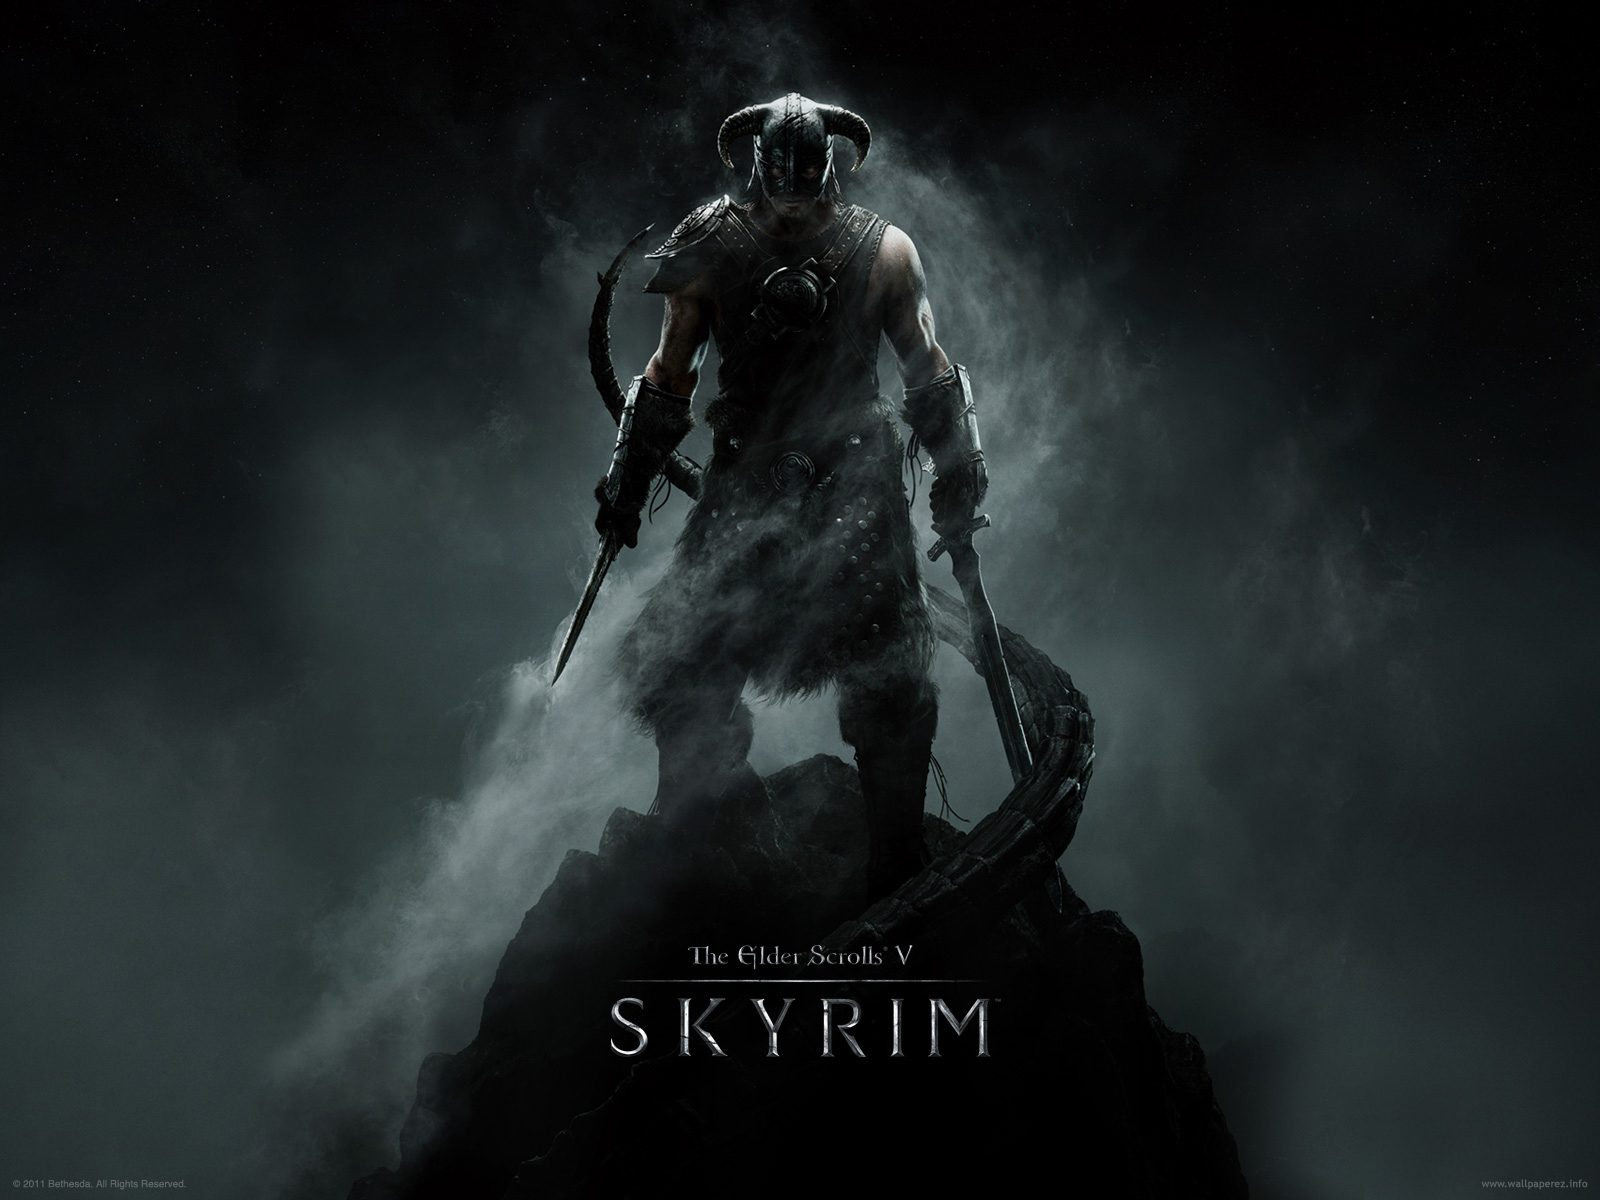 Elder-Scrolls-V-Skyrim-2135